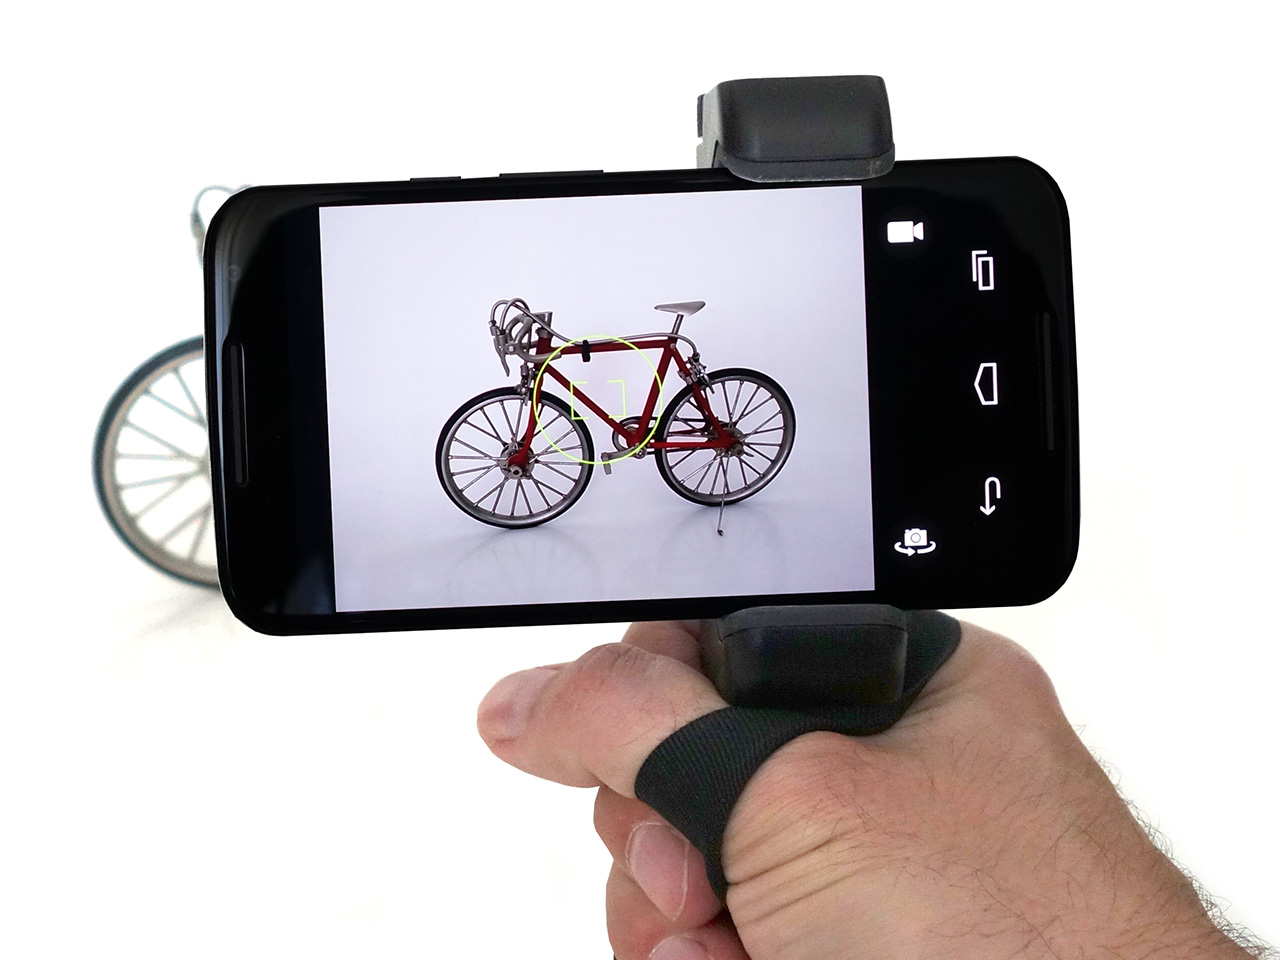 acheter en ligne fb74c 8c32f Shoulderpod S1 smartphone mount review: Digital Photography ...